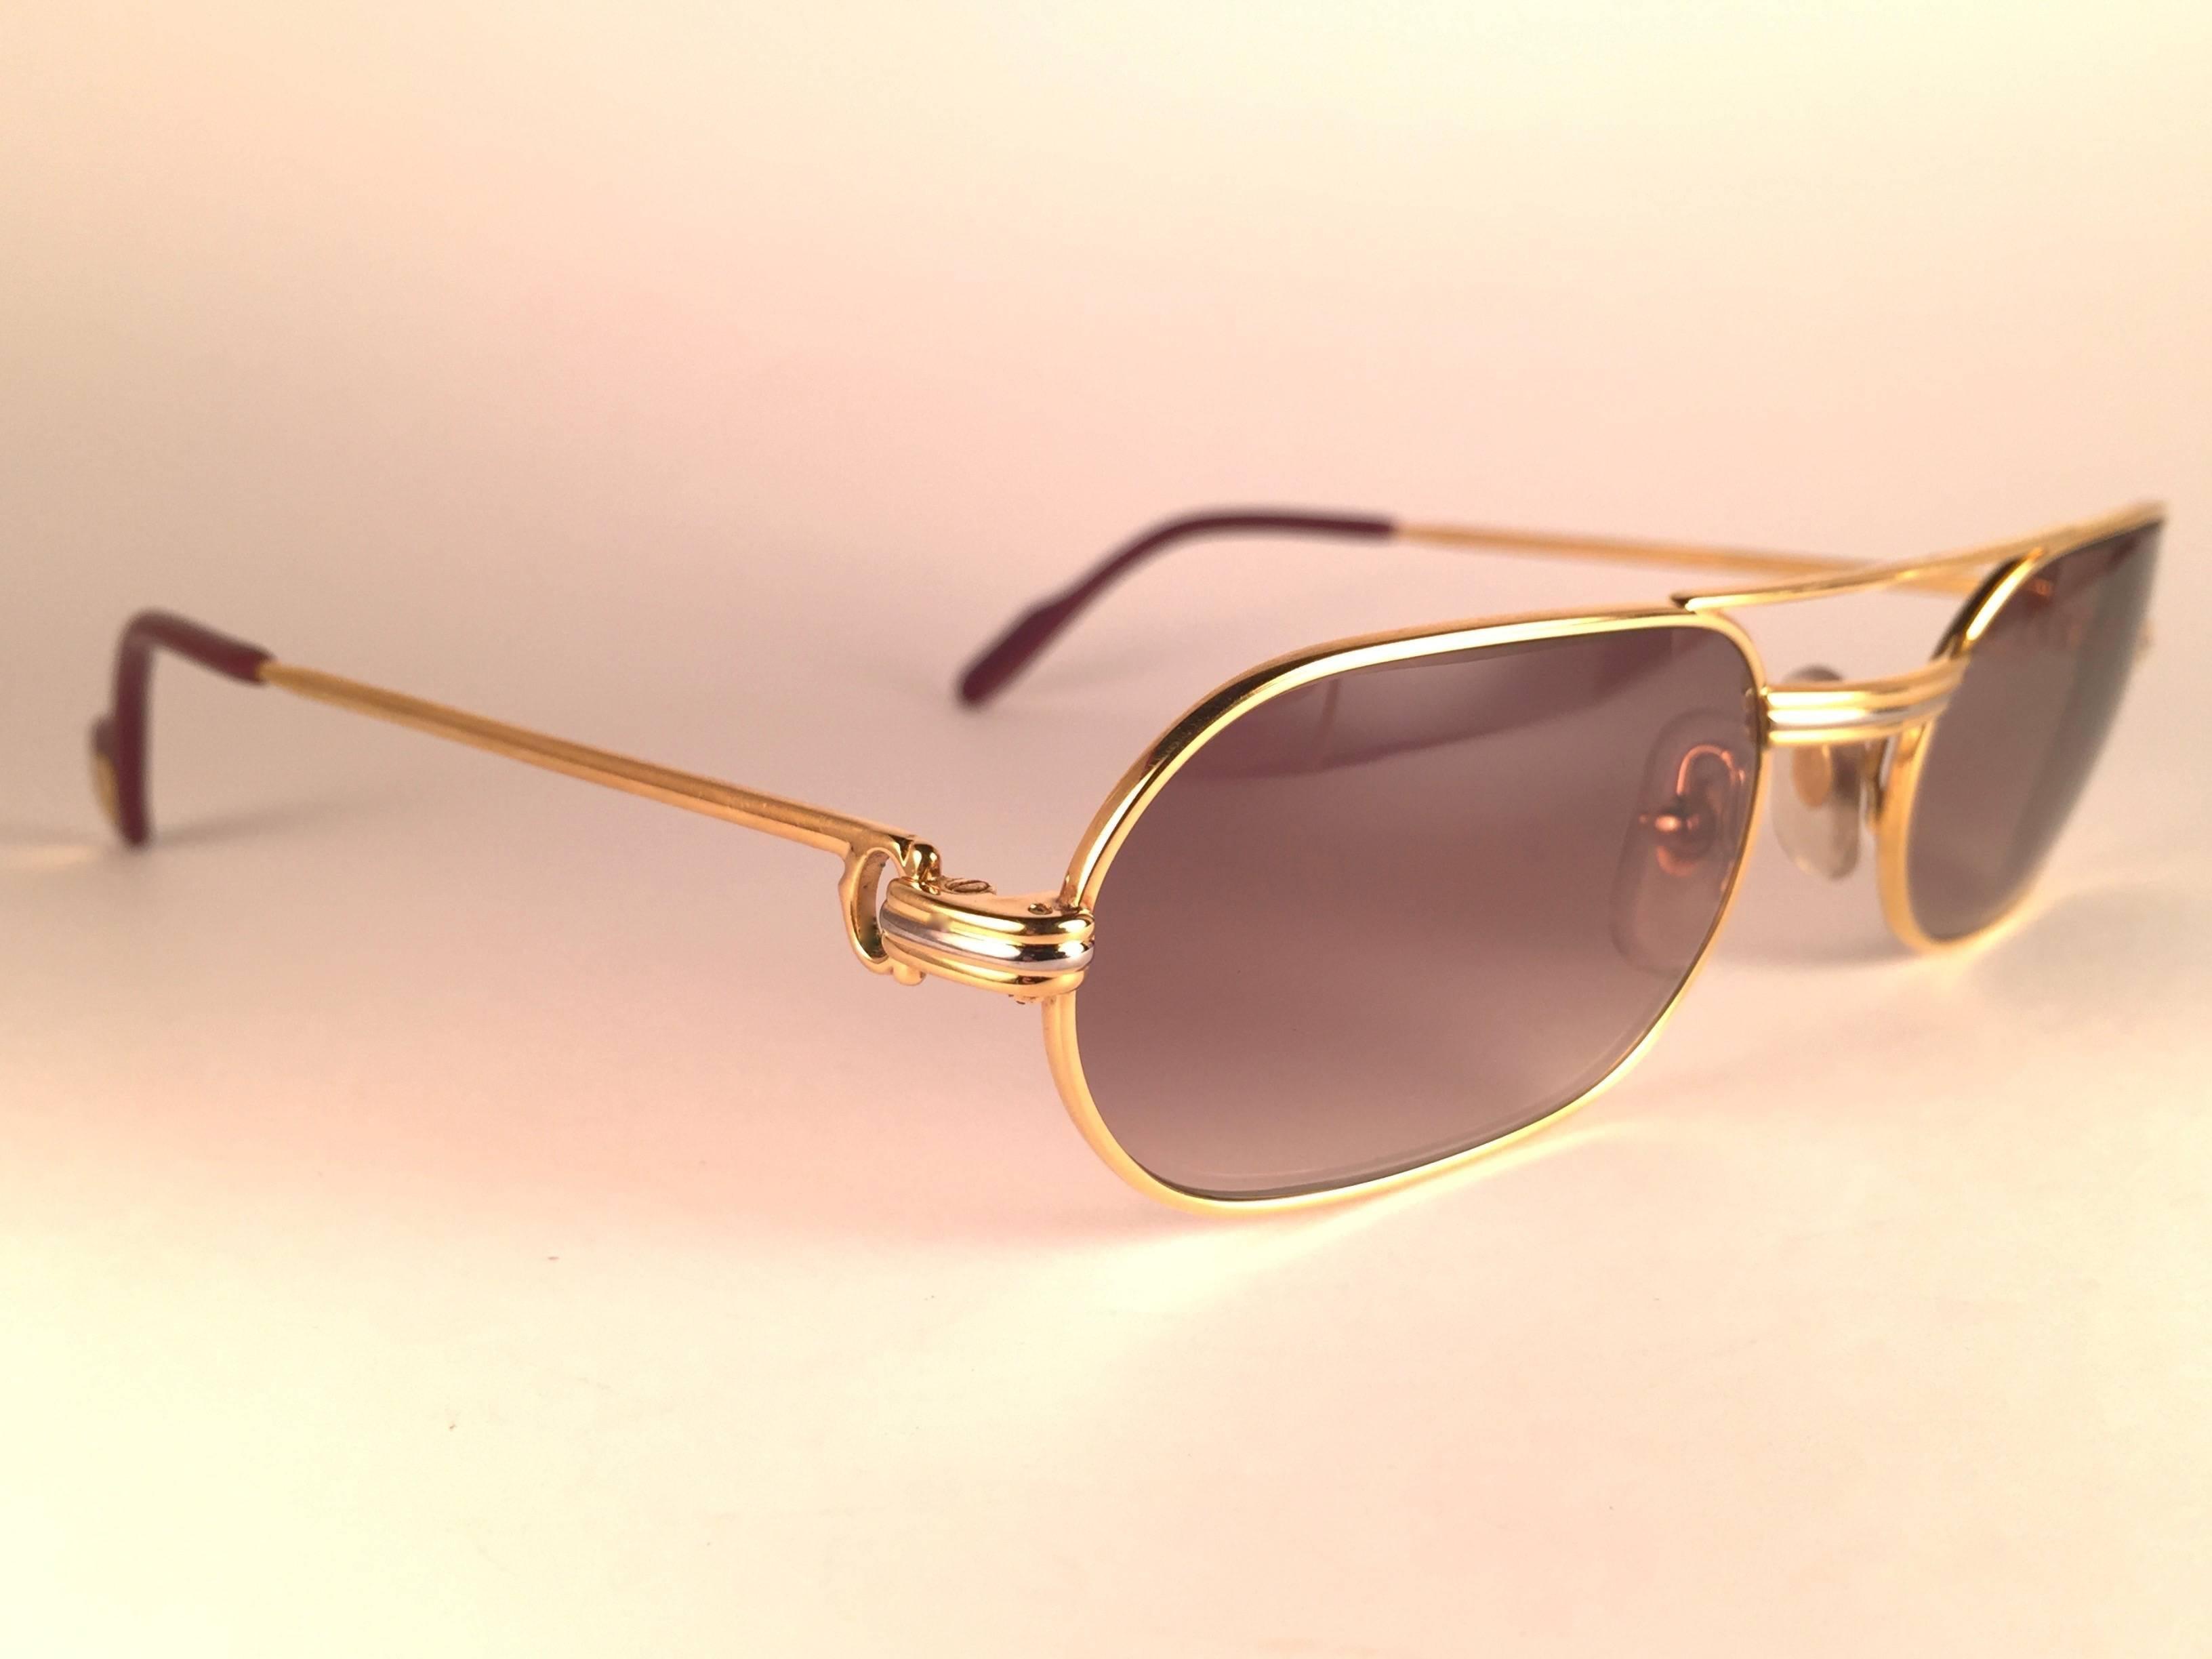 Cartier France Sunglasses Louis Vendome Vintage Medium OPXZkiu